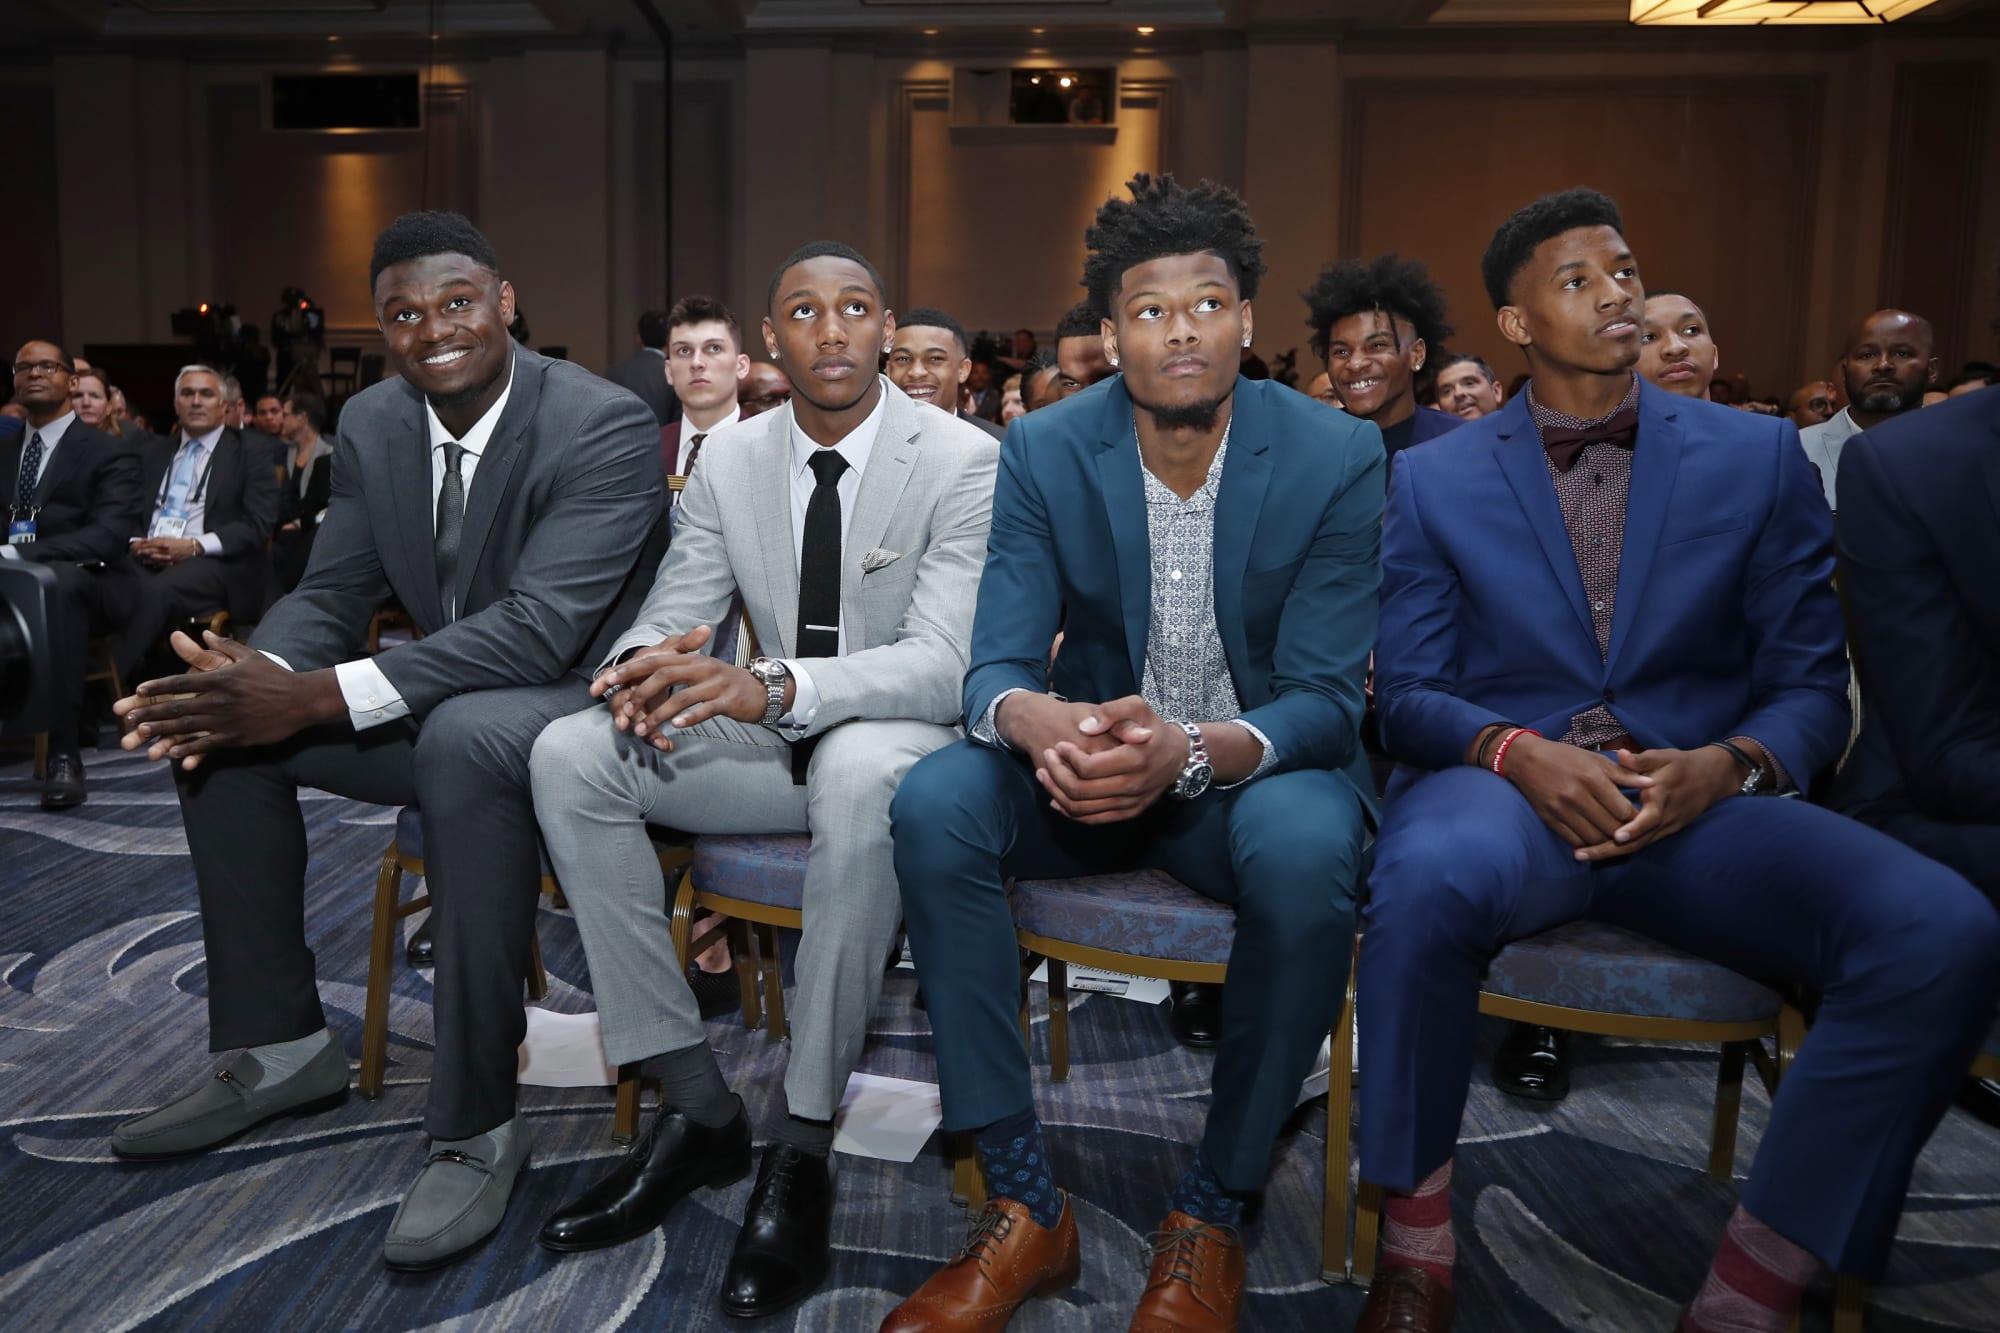 2019 nba draft mock draft featuring all